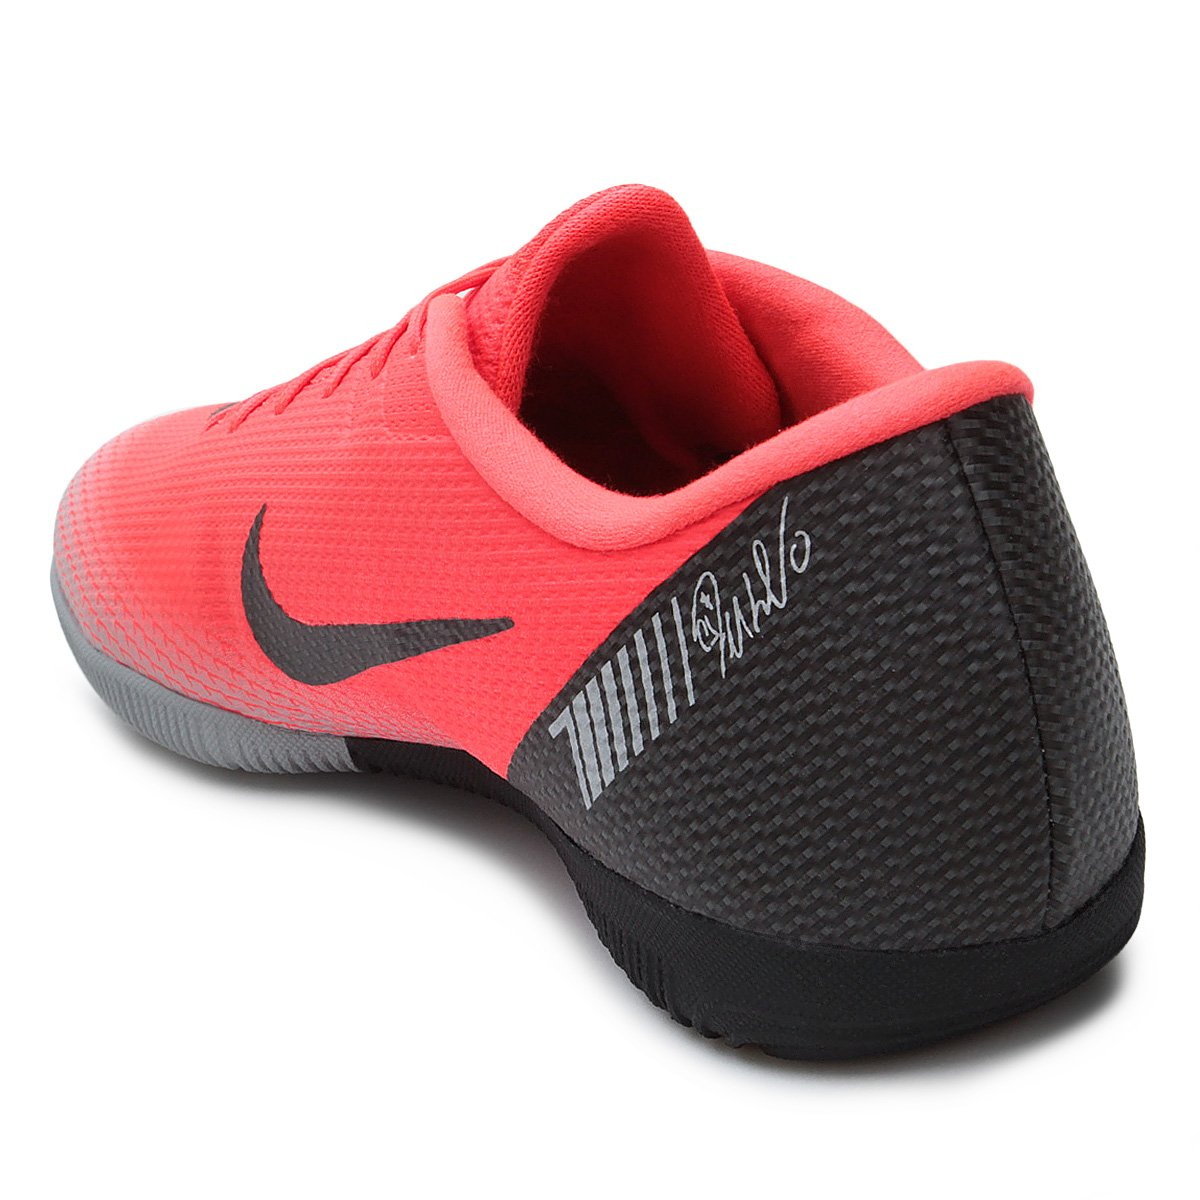 Chuteira Futsal Nike Mercurial Vapor 12 Academy CR7 IC - Vermelho ... 38df3b0a1fc9c